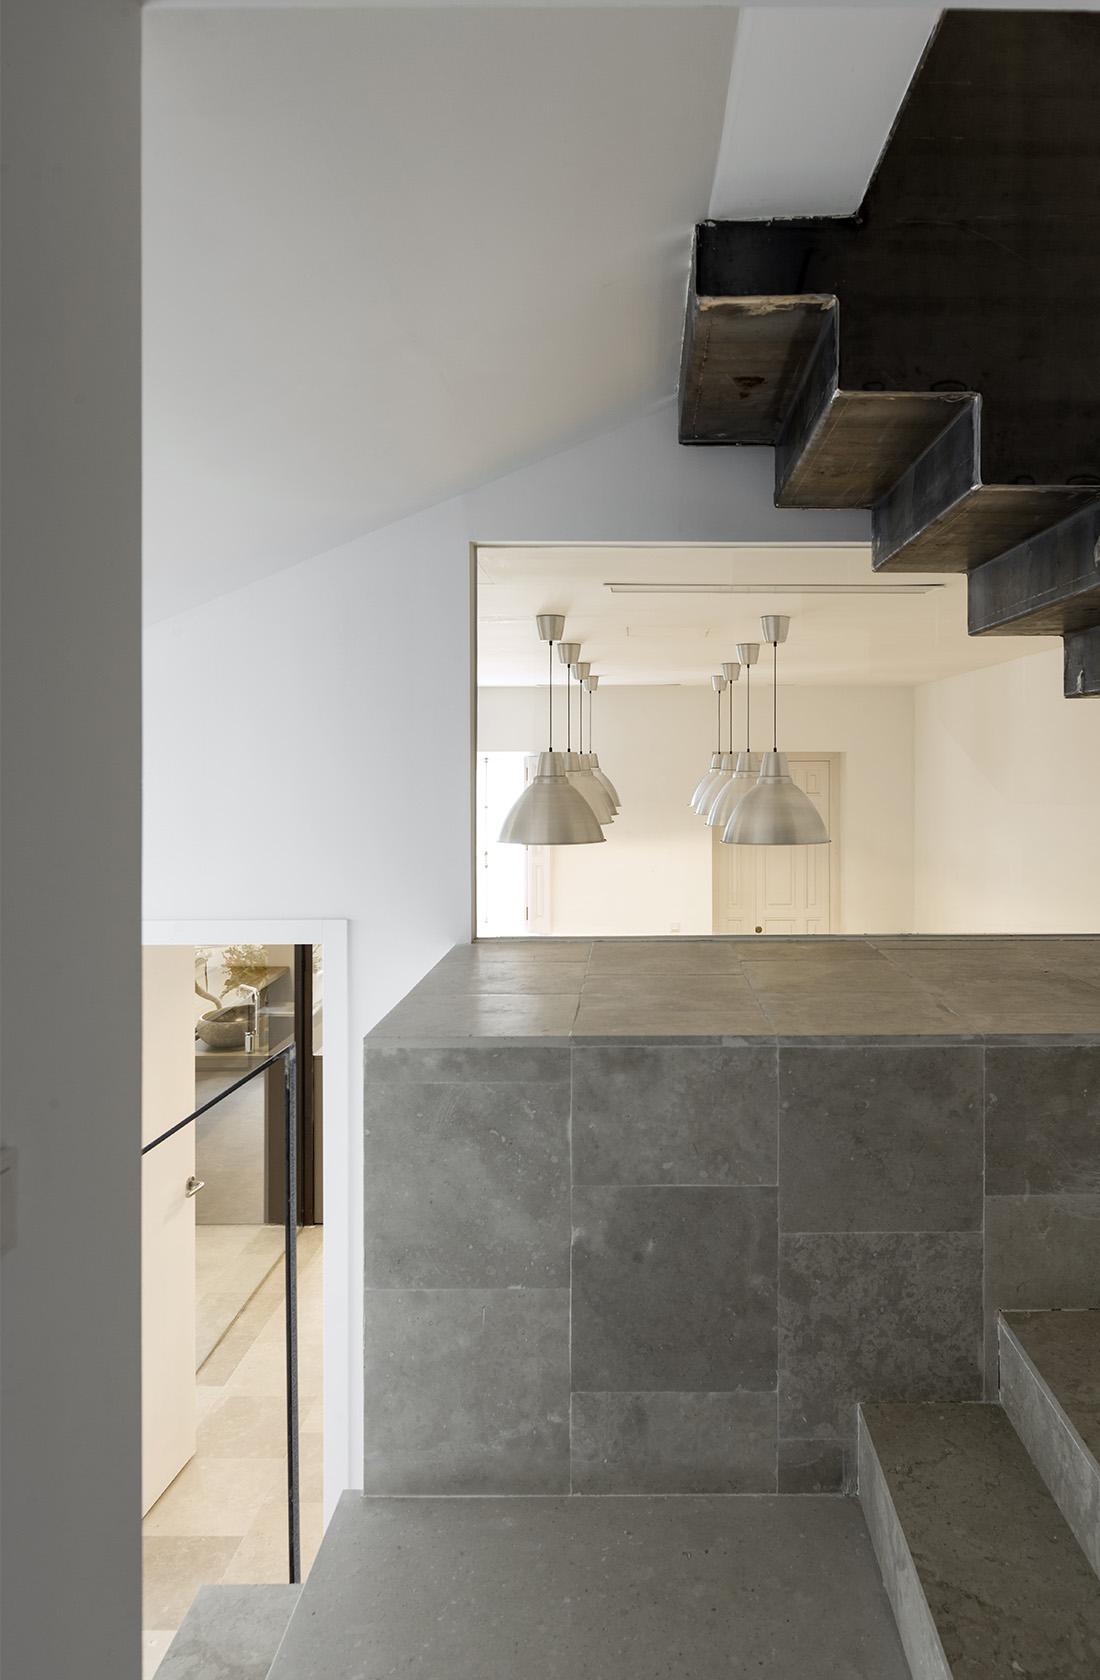 Escaleras del duplex Clínica Dental Atelier González-Solano